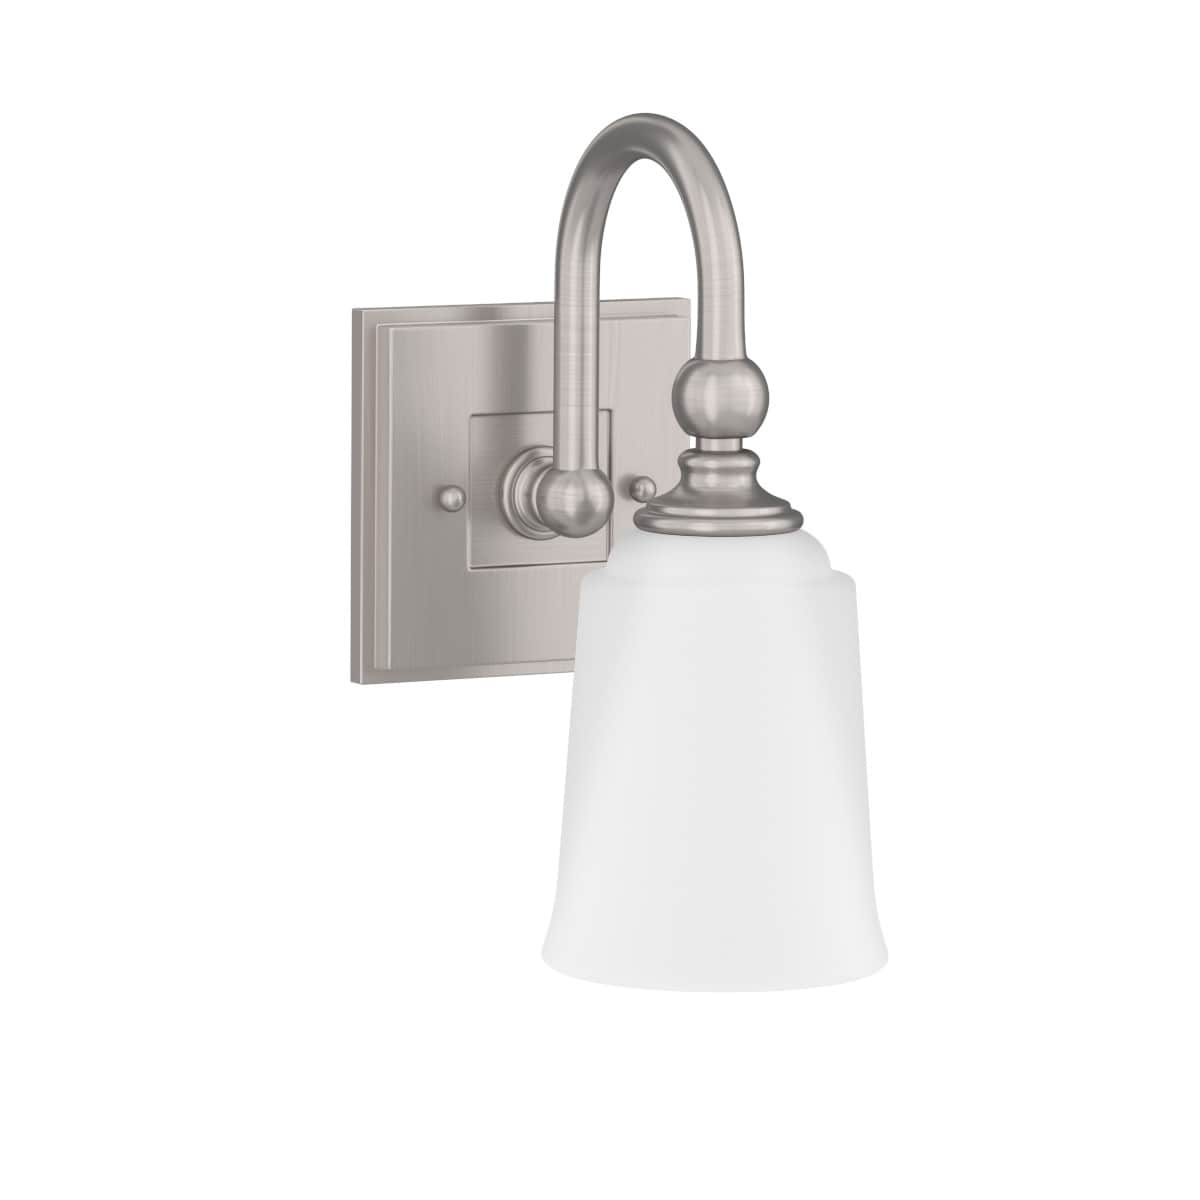 Shop Park Harbor Phvl2121 Antonia Single Light 4 3 4 Wide Bathroom Sconce Overstock 12939395